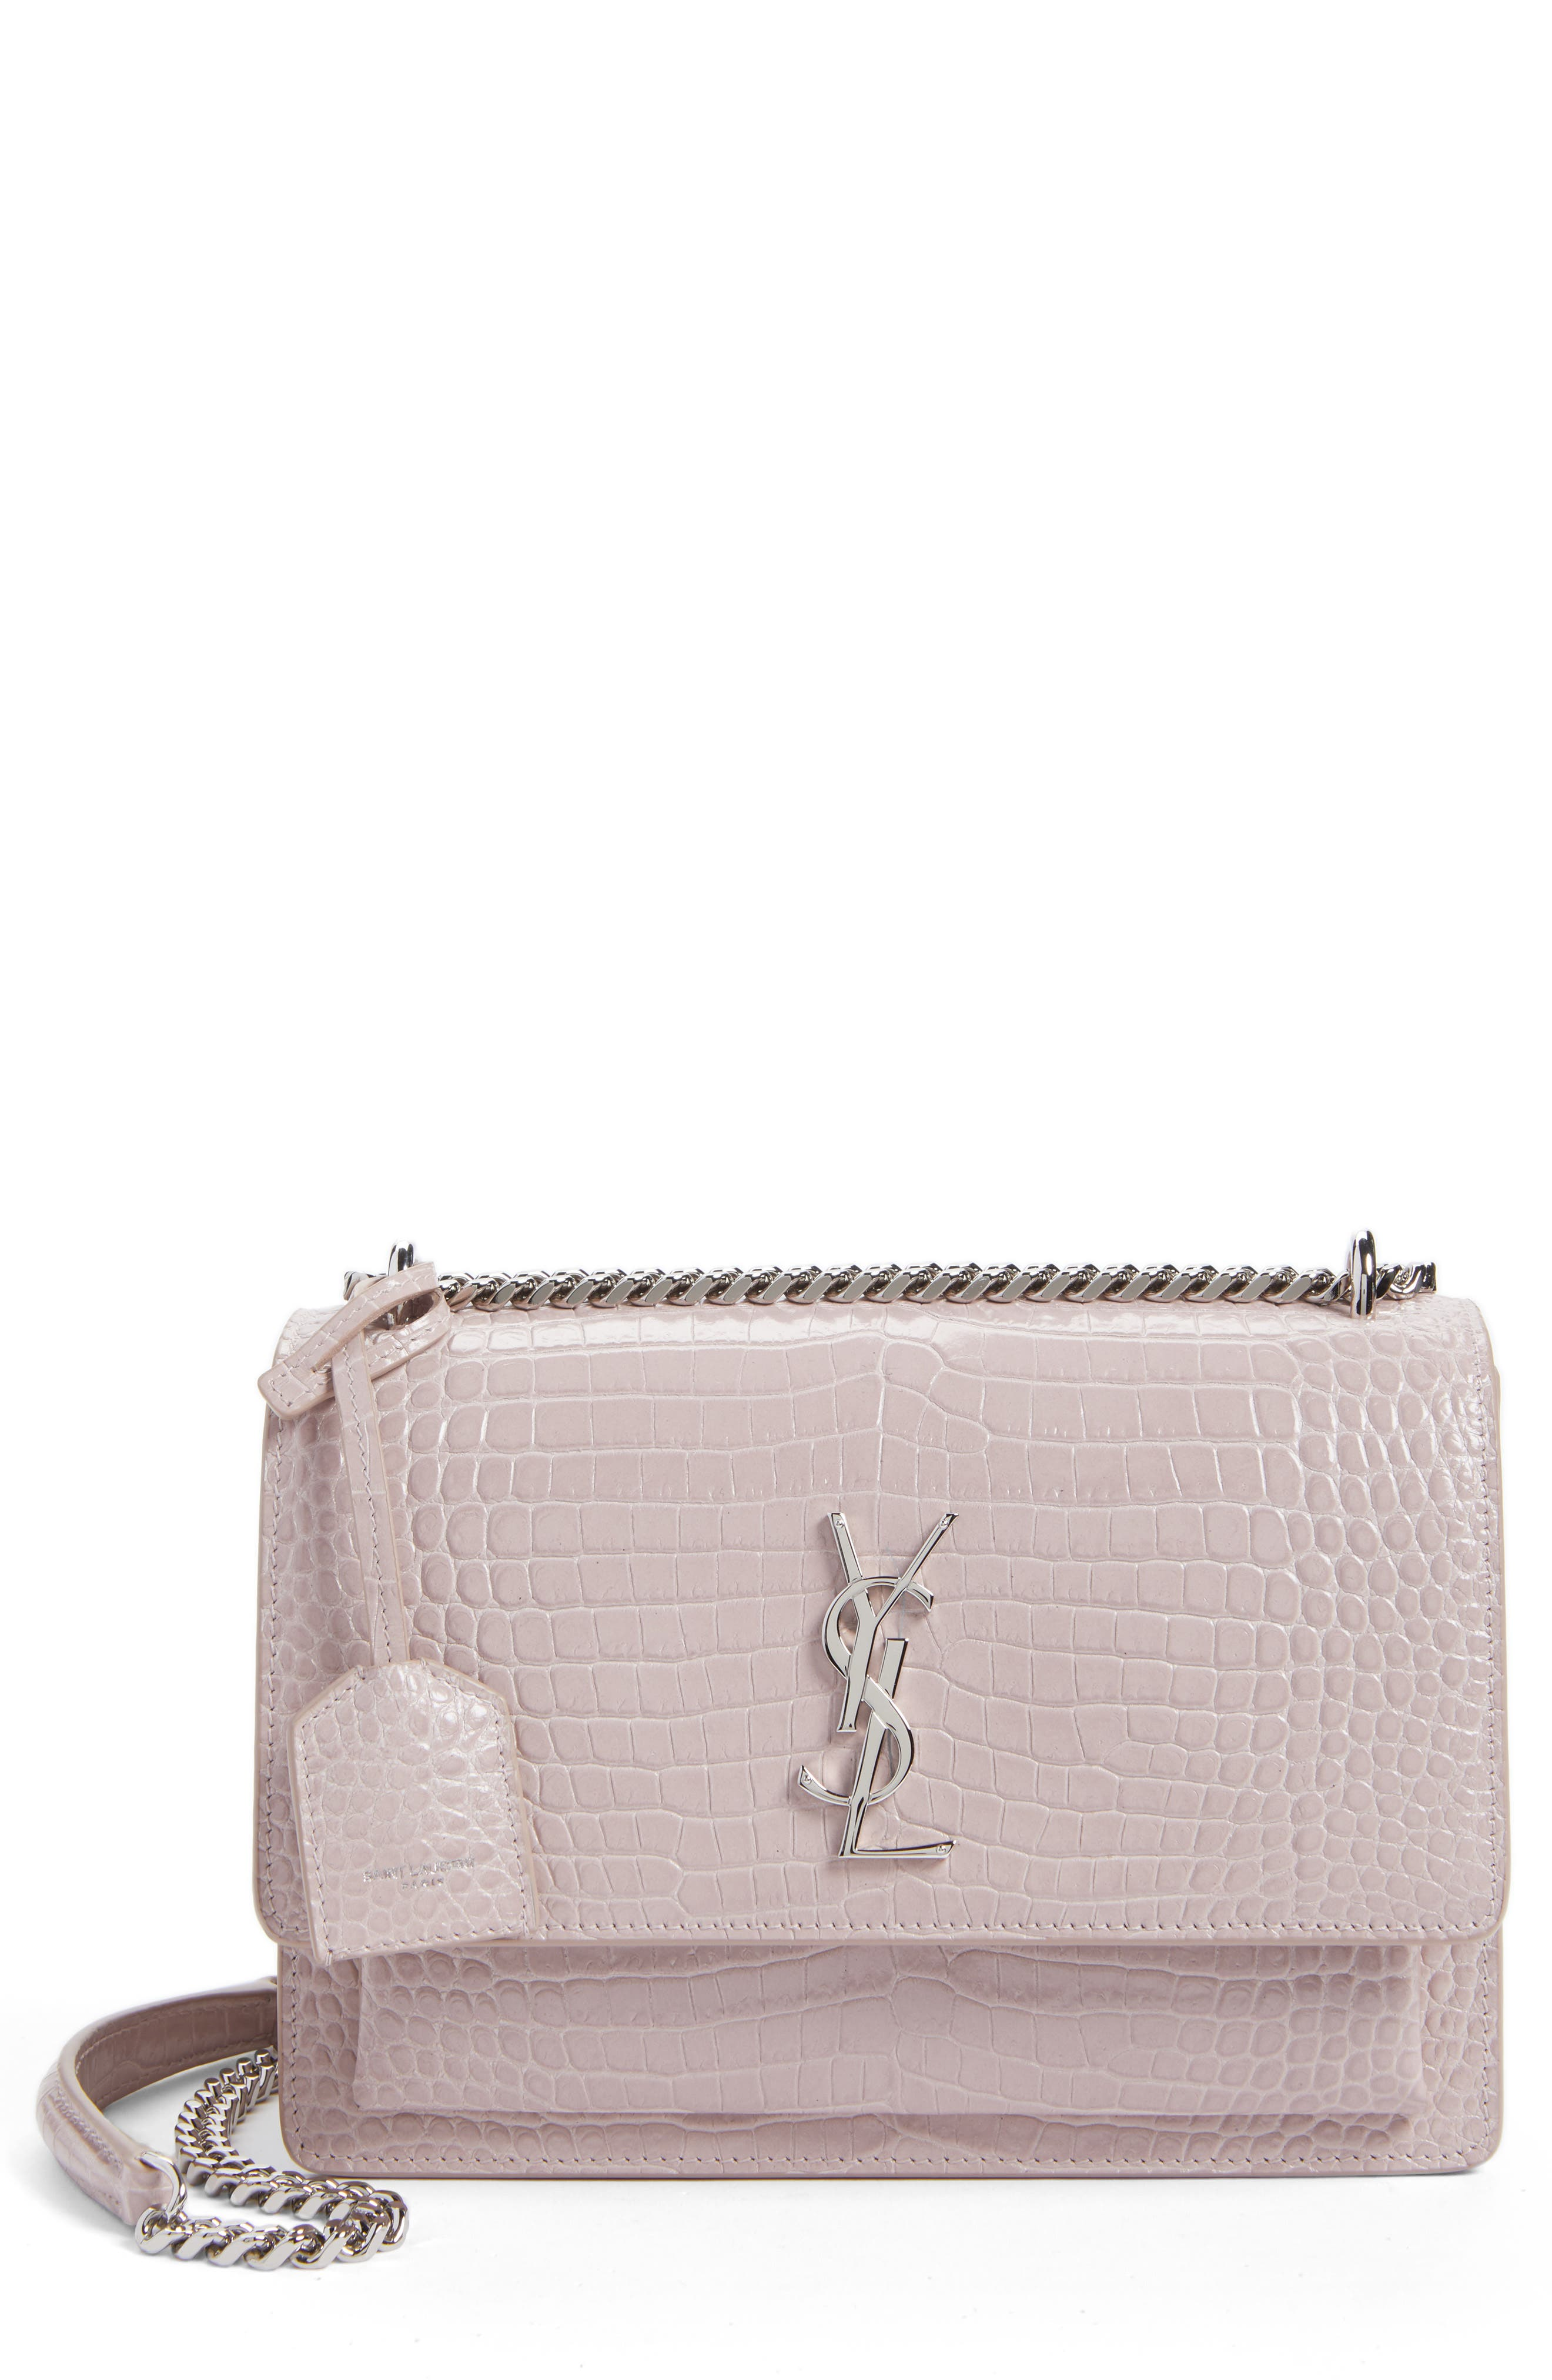 Saint Laurent 'Medium Monogram Sunset' Croc Embossed Leather Shoulder Bag